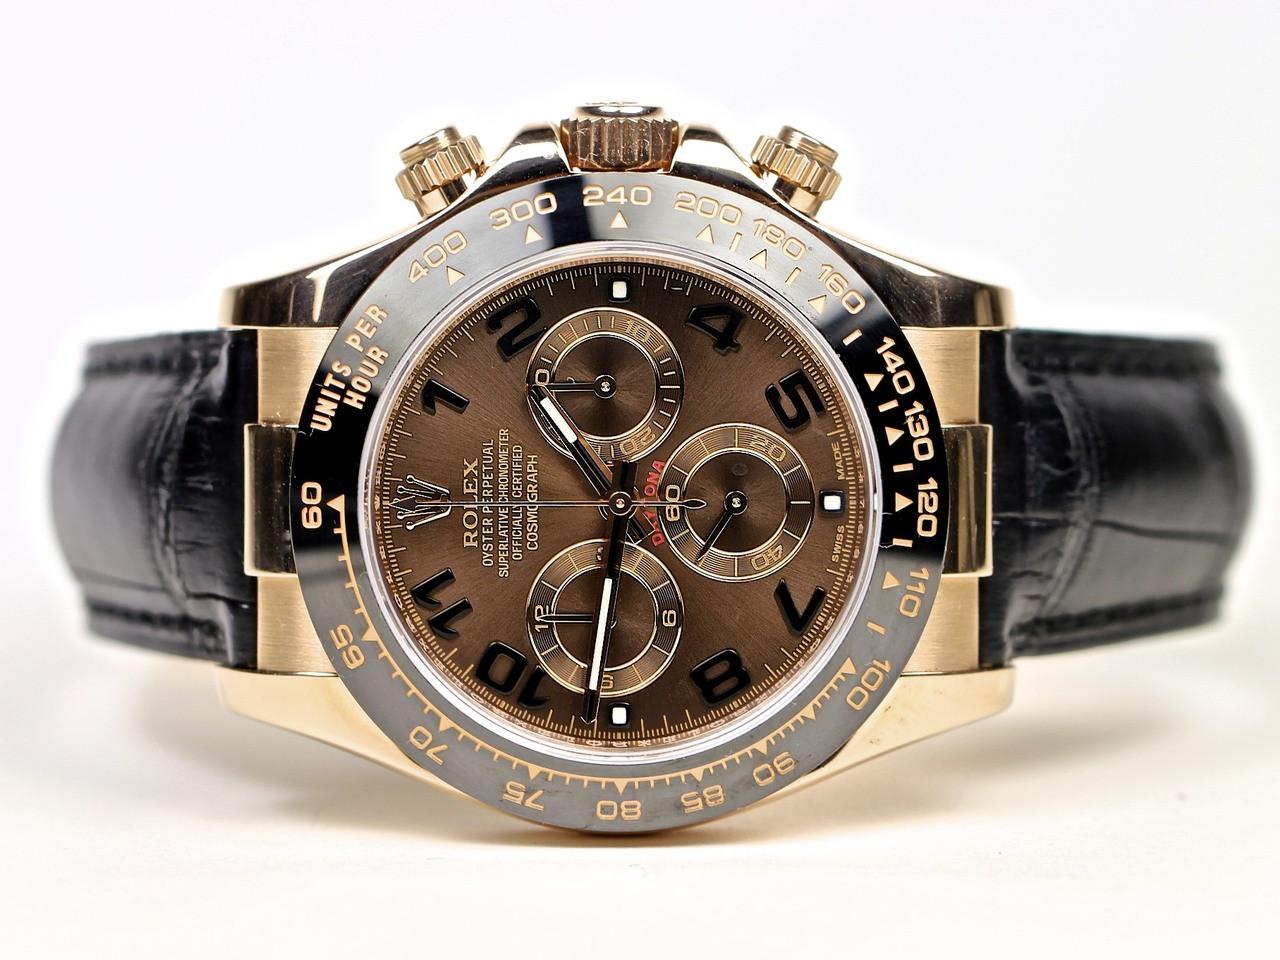 Rolex Watches Daytona Everose Gold 116515 Www Legendoftime Com